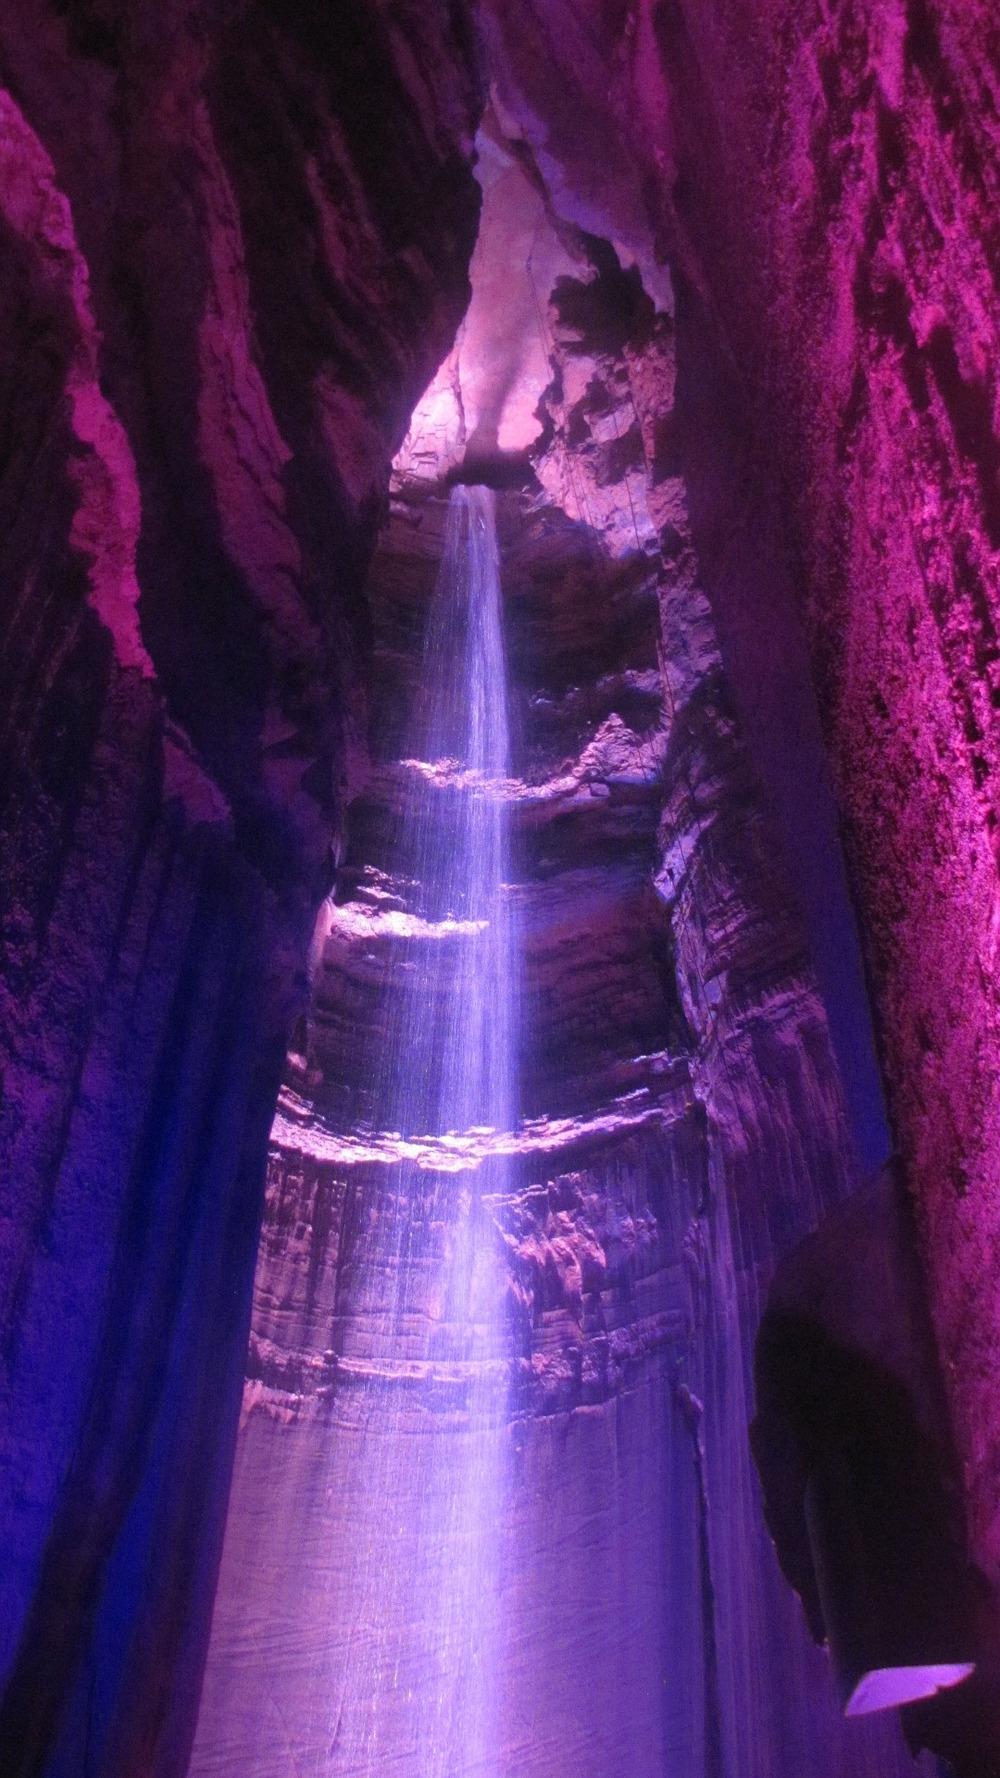 ruby-falls-61175_1920.jpg